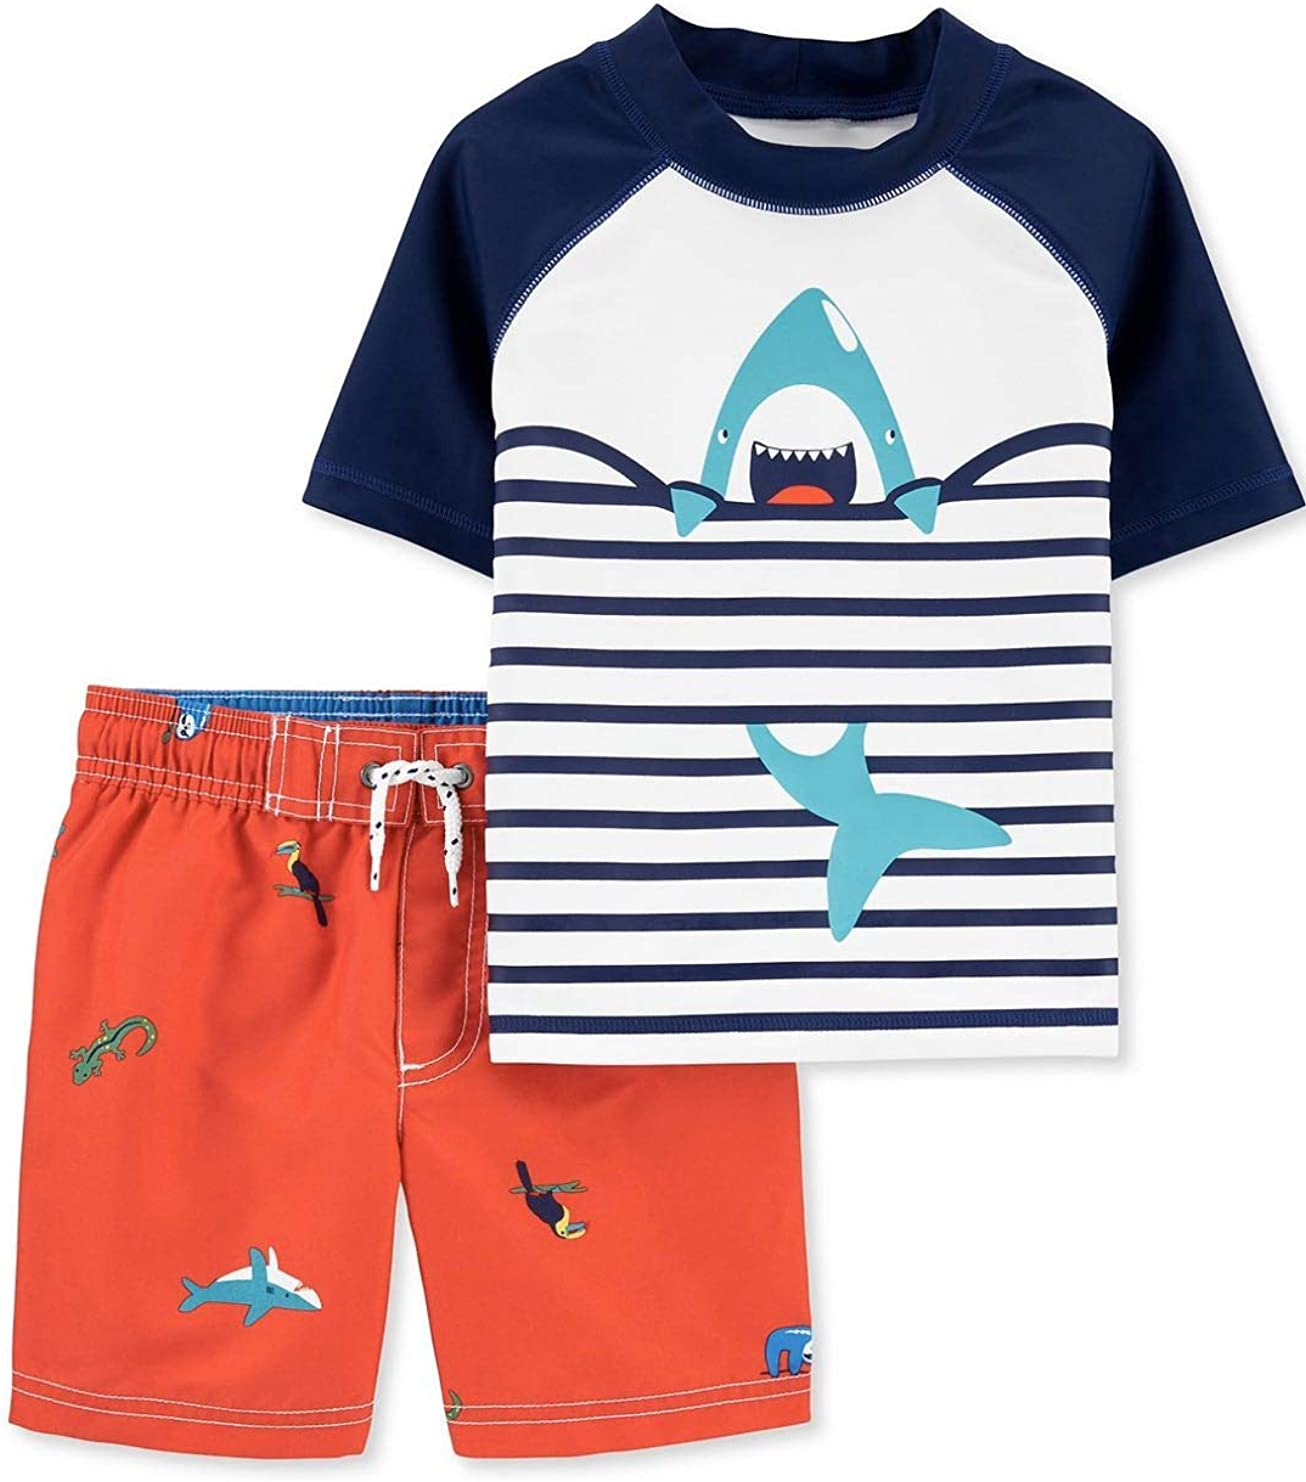 Carter's Toddler and Baby Boy's Rashguard Swim Set